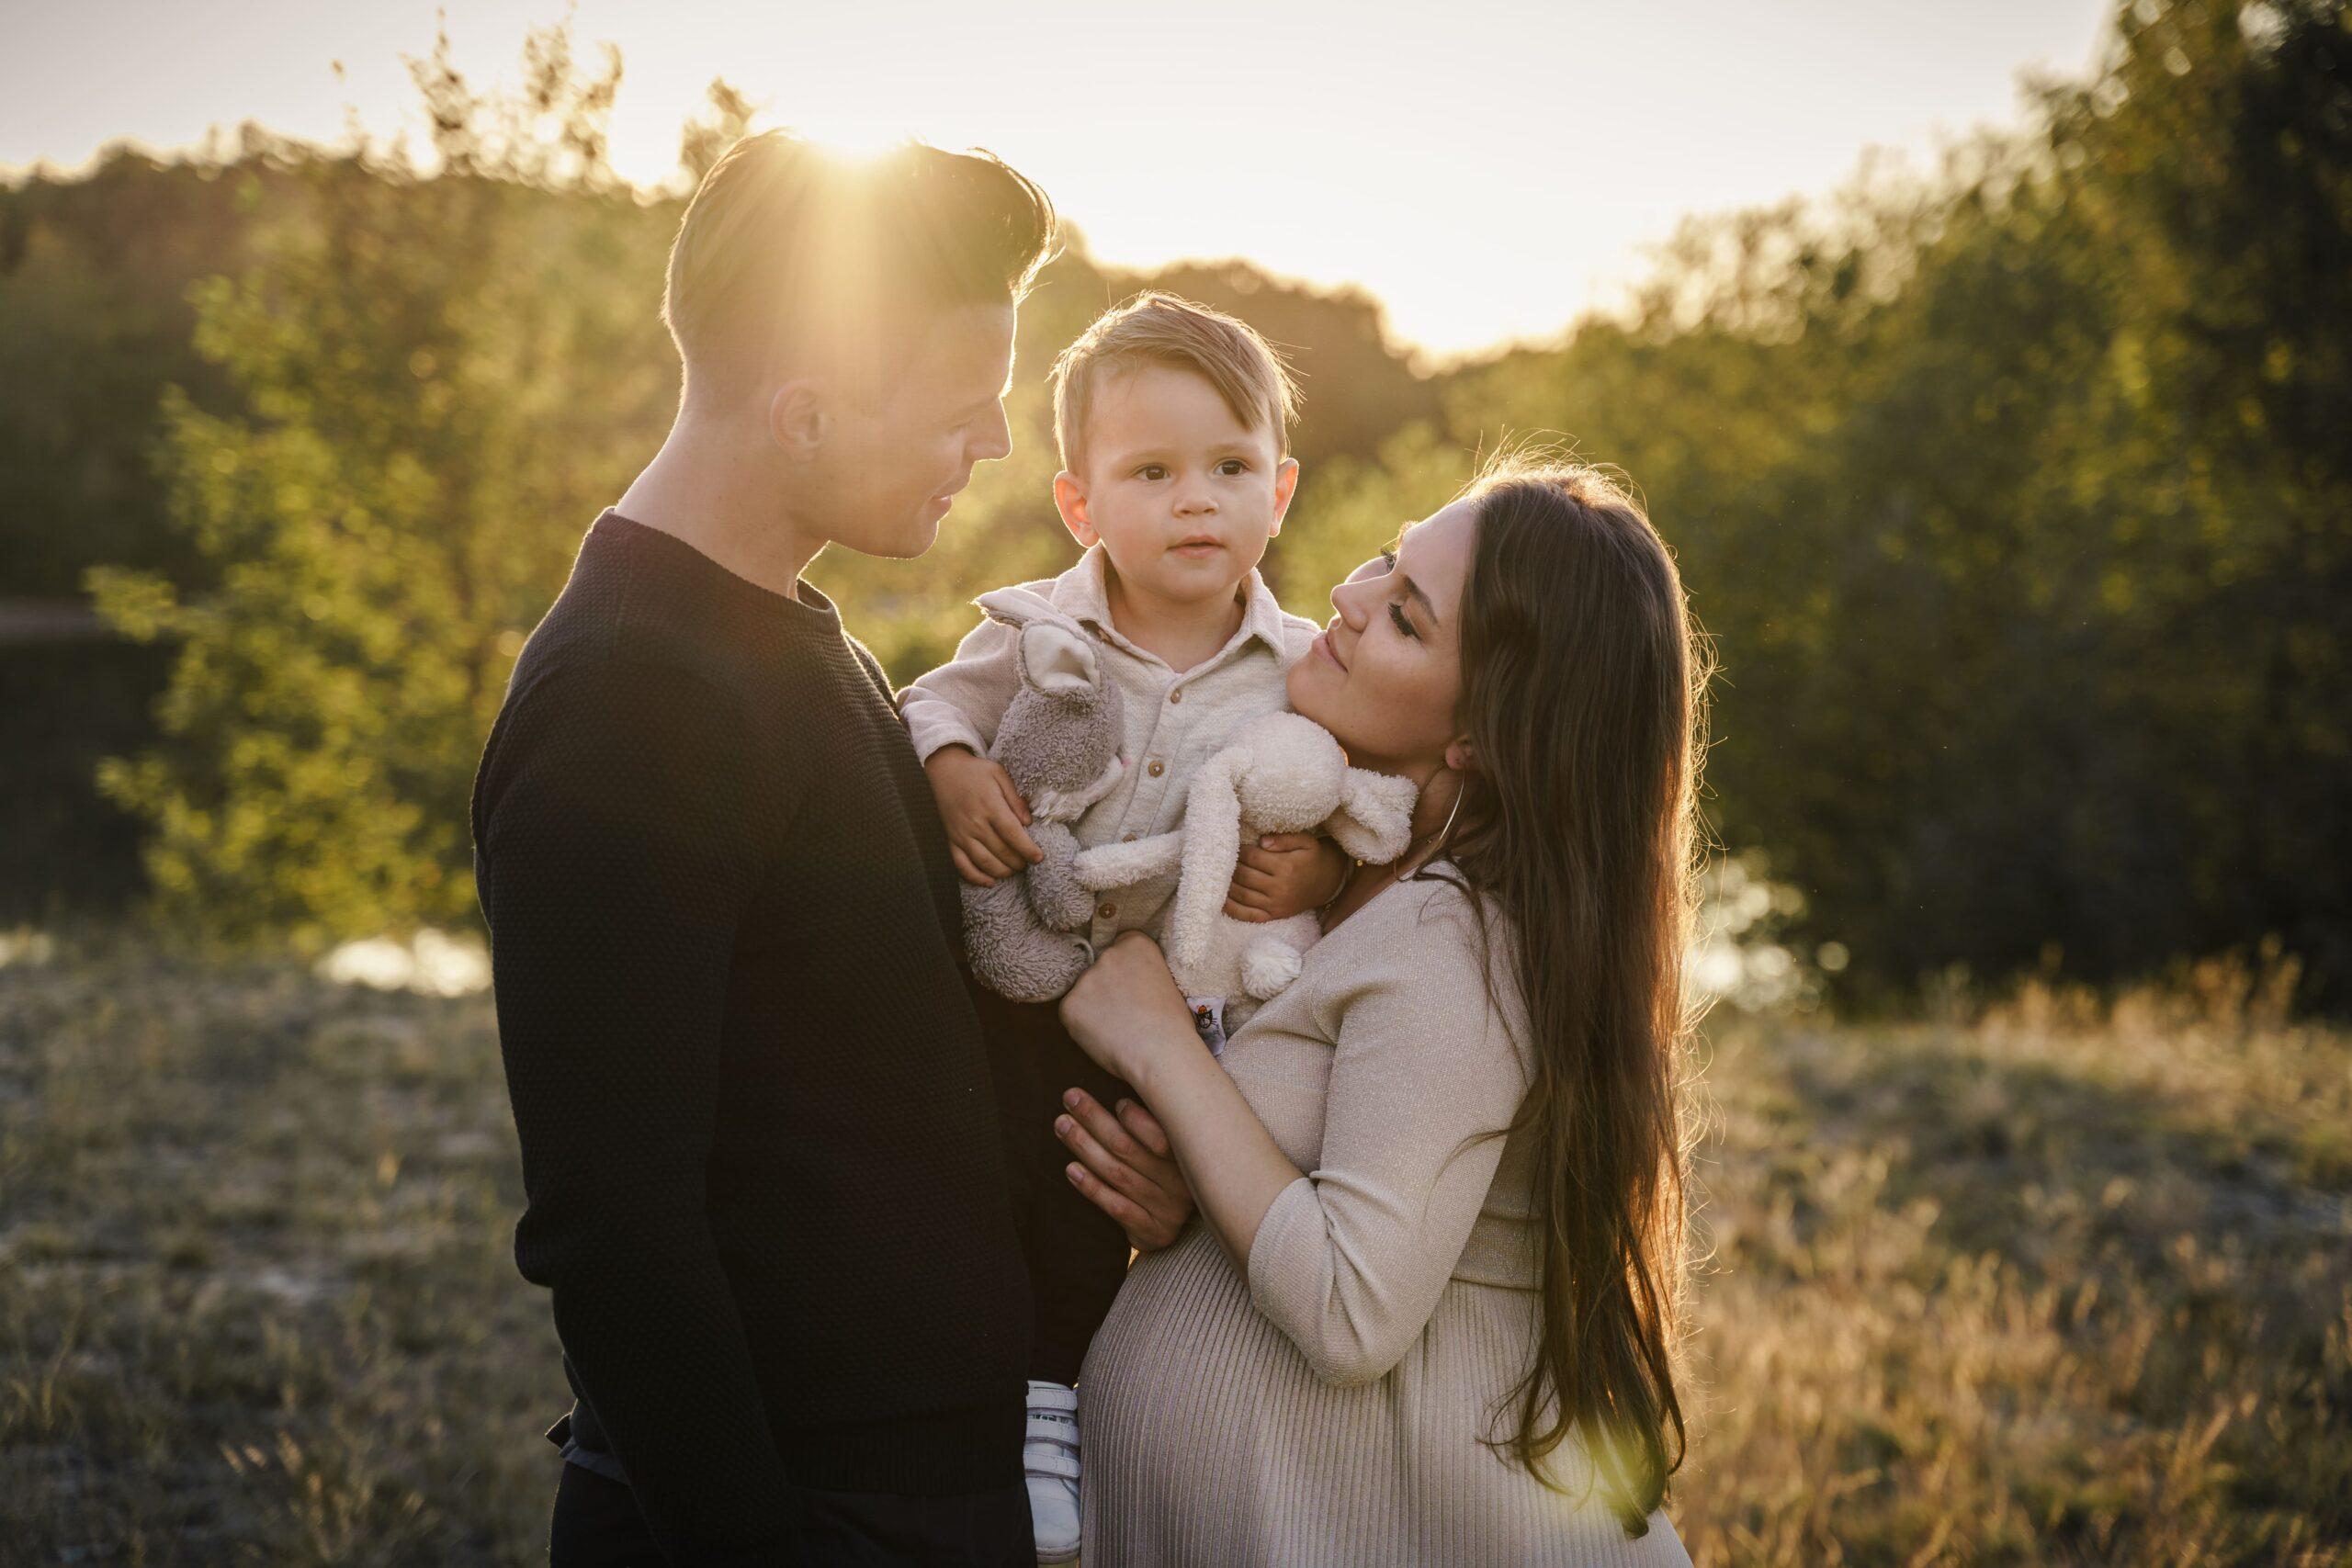 Familienfotografin Achim